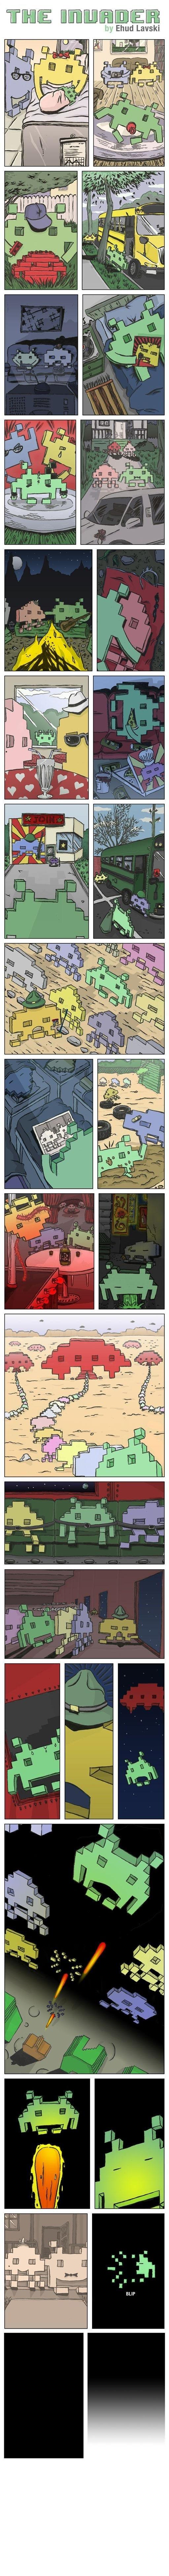 """The Invader"" la historia de un Space Invader"